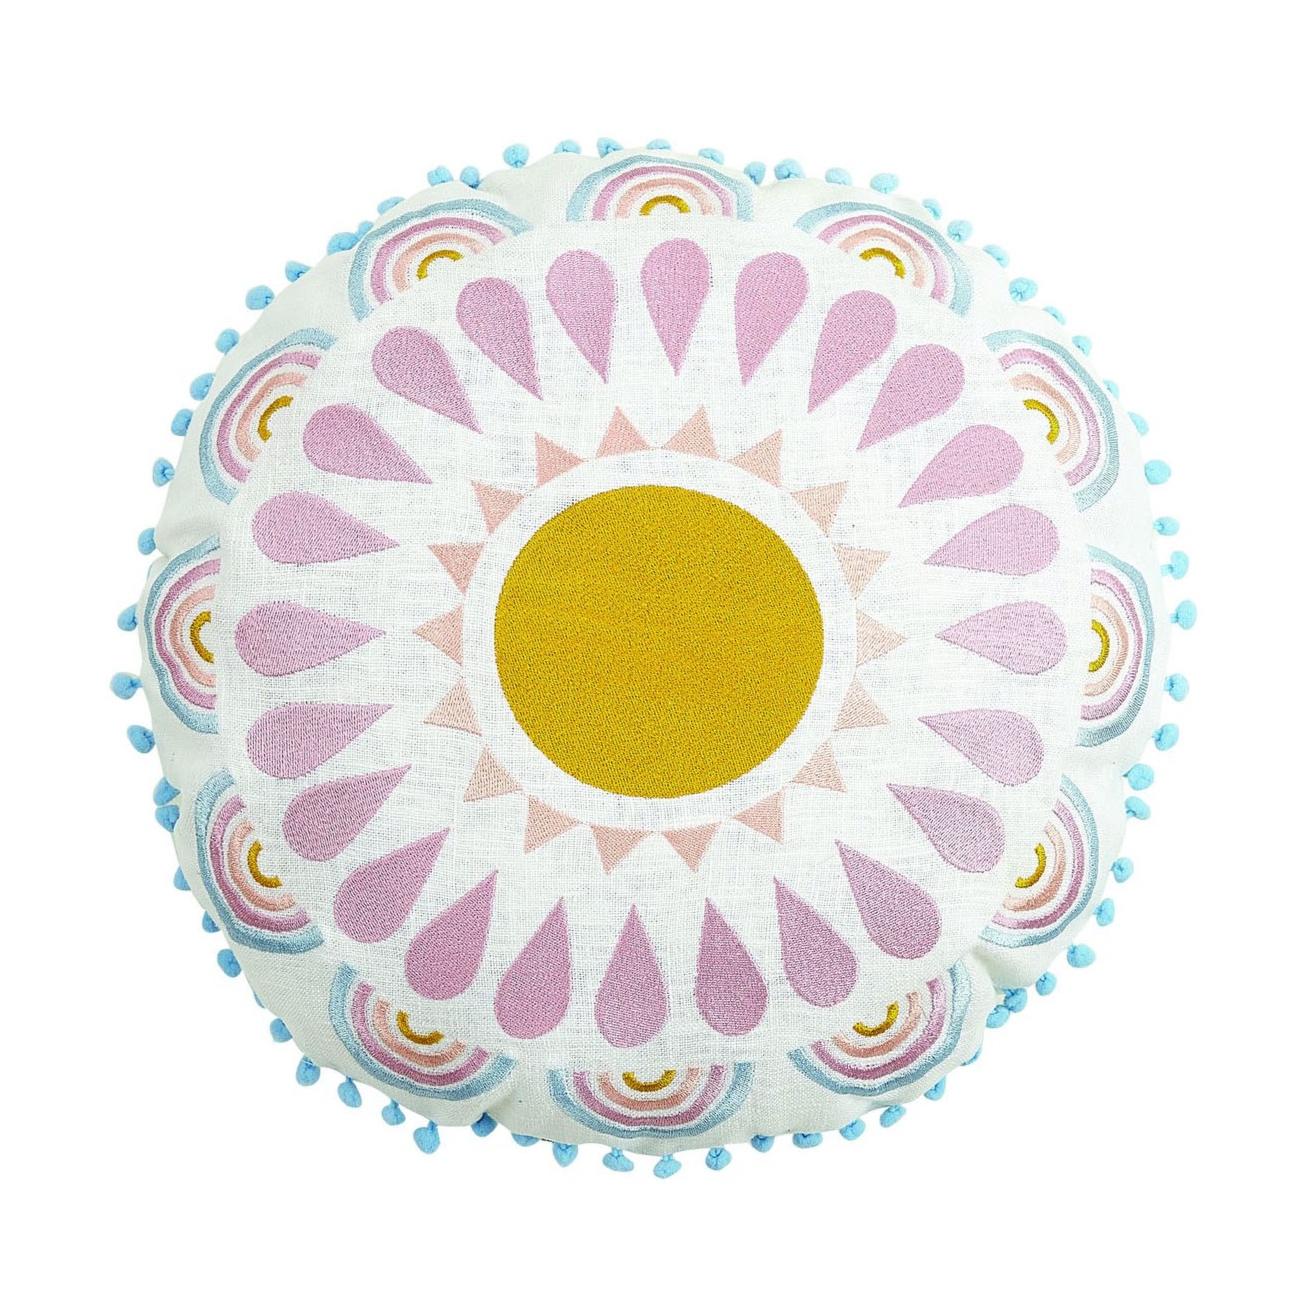 EO_SunPillowcircle.jpg